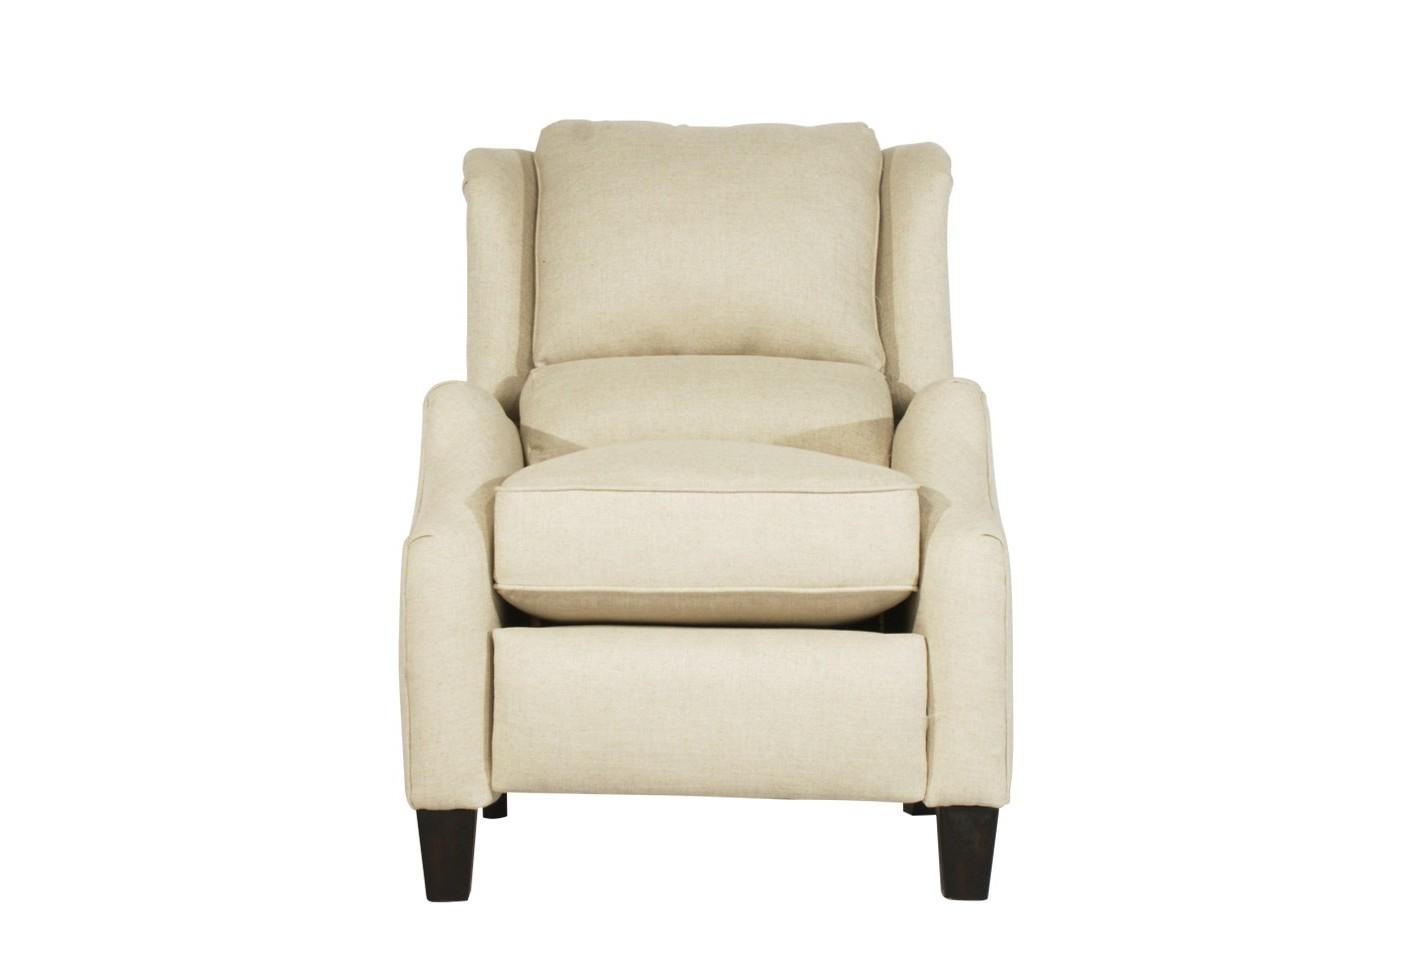 Кресло Liar ReclinerИнтерьерные кресла<br><br><br>Material: Текстиль<br>Width см: 77<br>Depth см: 101<br>Height см: 106